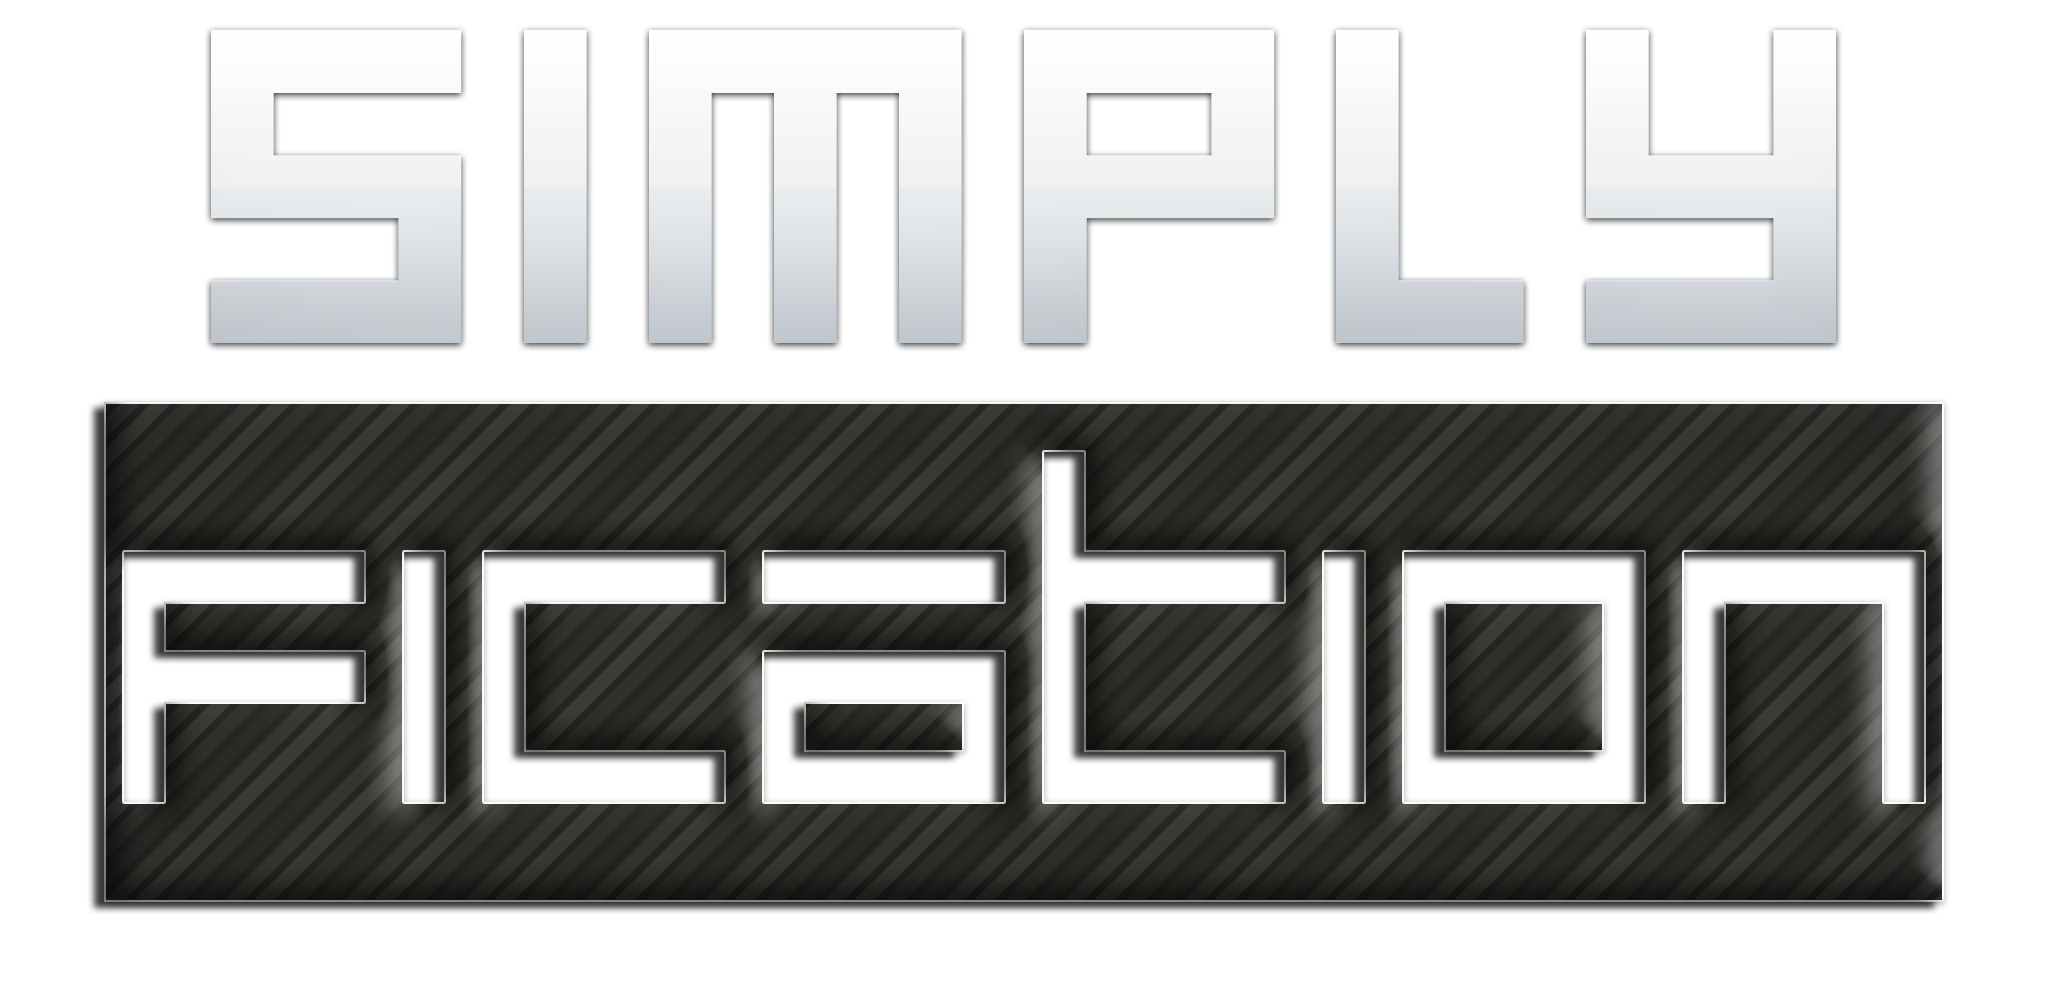 http://fc09.deviantart.net/fs70/f/2014/100/d/e/logo_by_ov3rhell3xoduz-d7dylnd.png